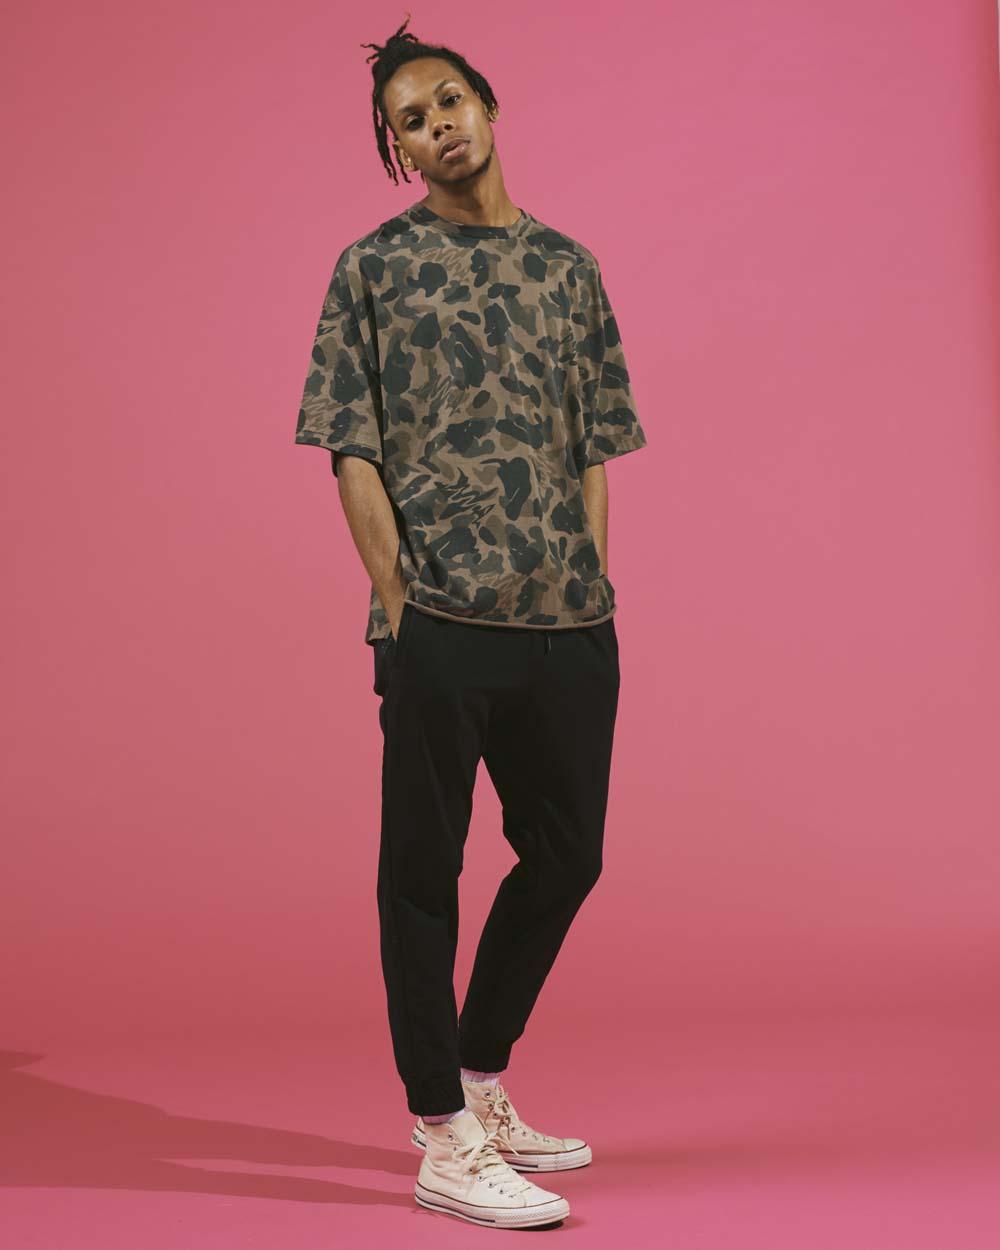 CONVERSE TOKYO × DIM MAKのコラボレーションラインがスタート